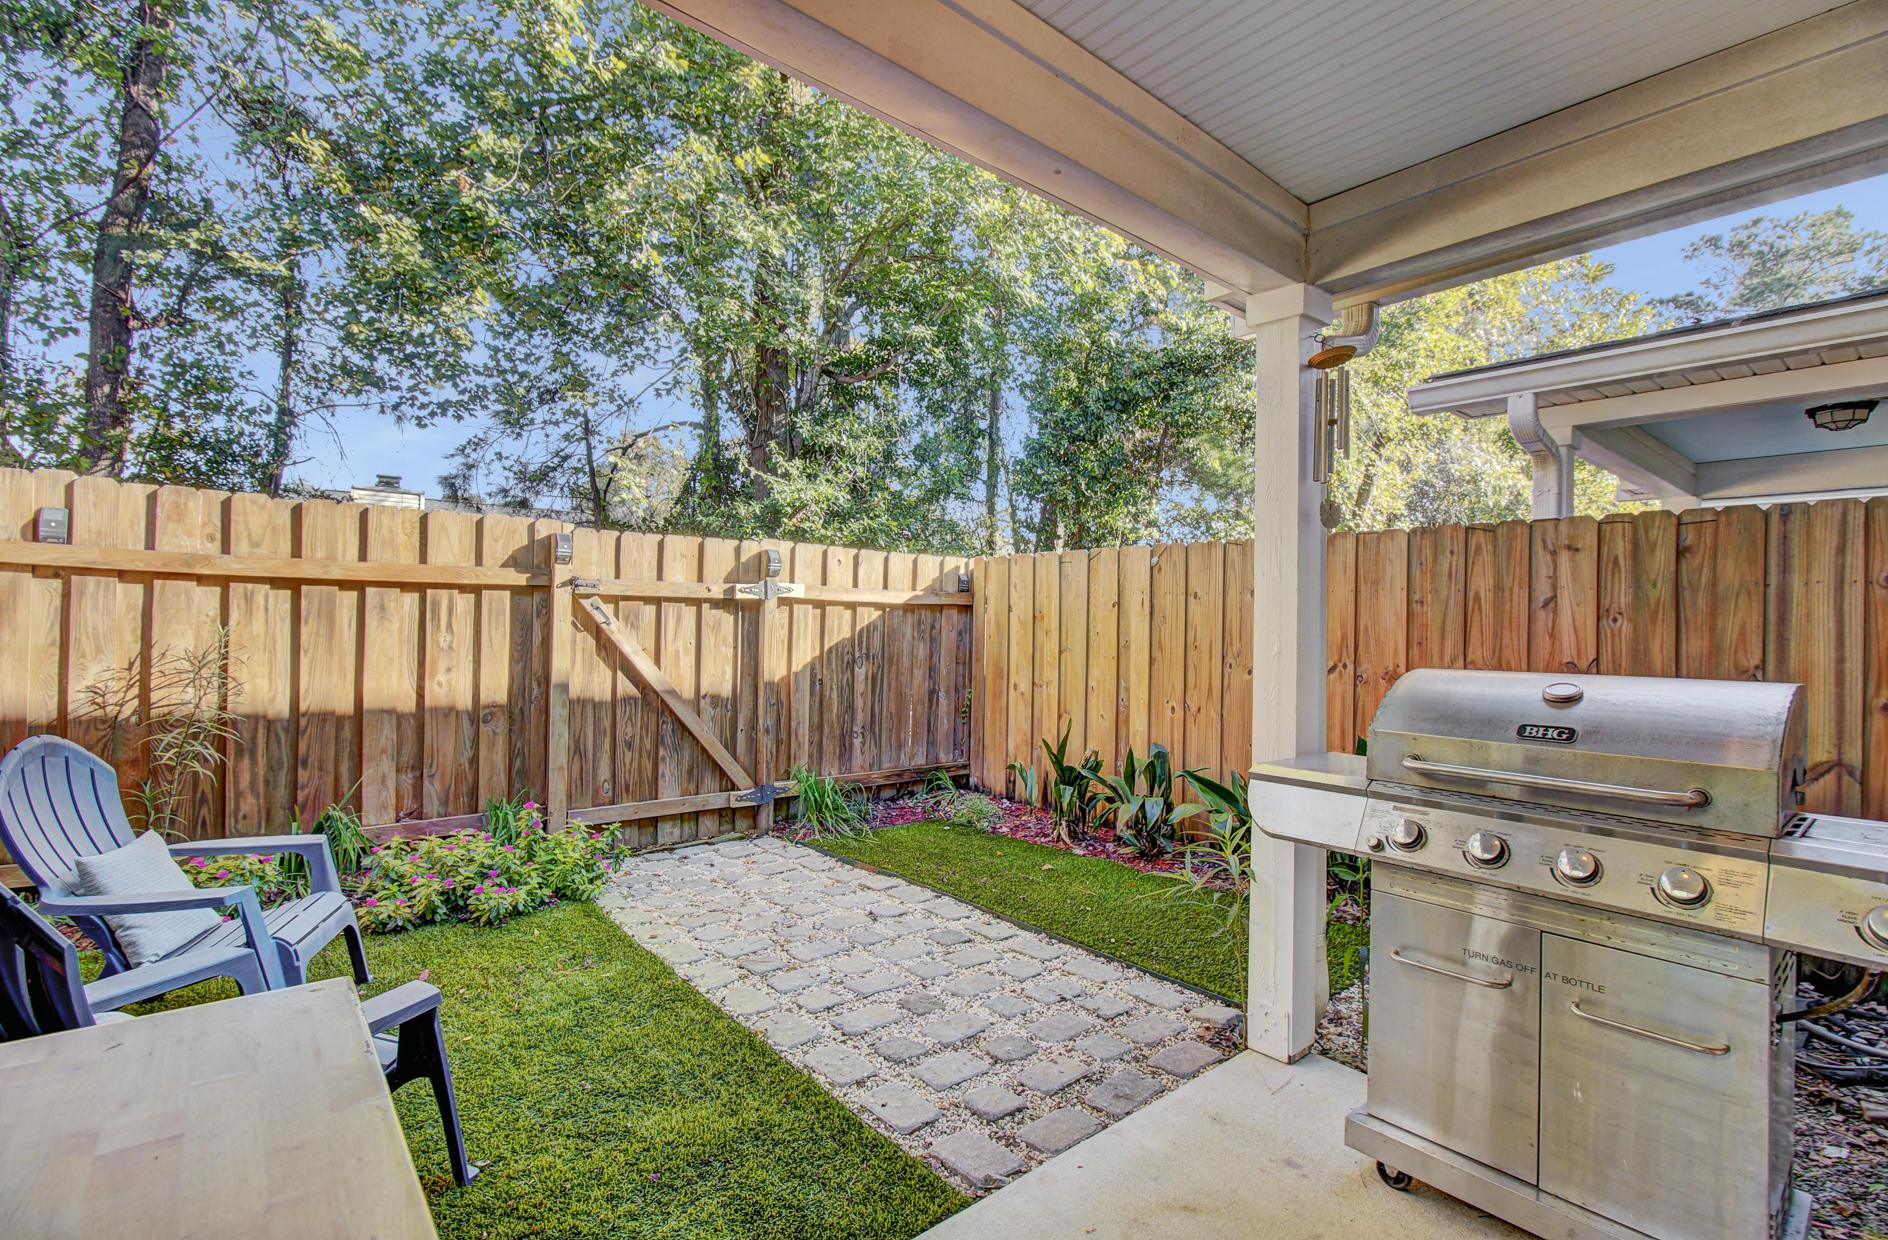 Carol Oaks Town Homes Homes For Sale - 2956 Emma, Mount Pleasant, SC - 24